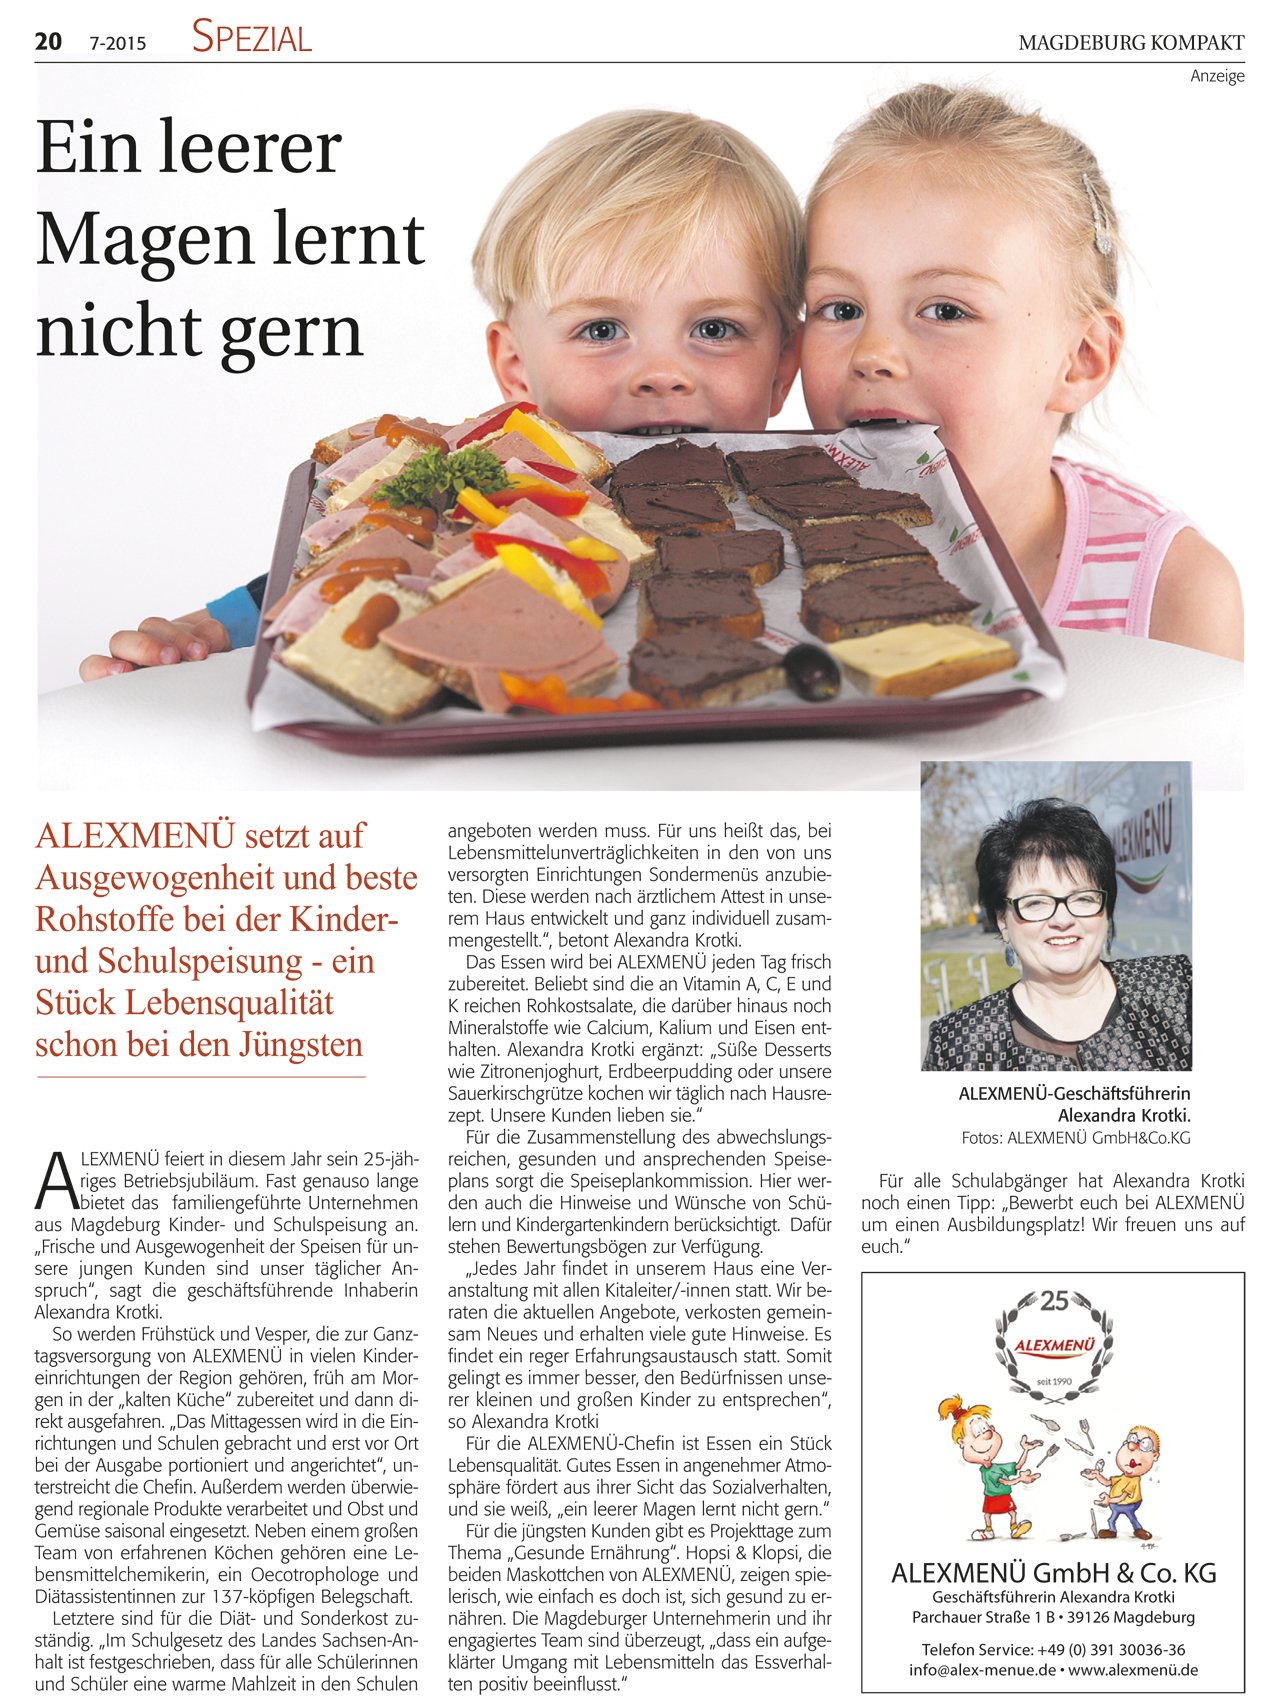 Beitrag aus Magdeburg Kompakt